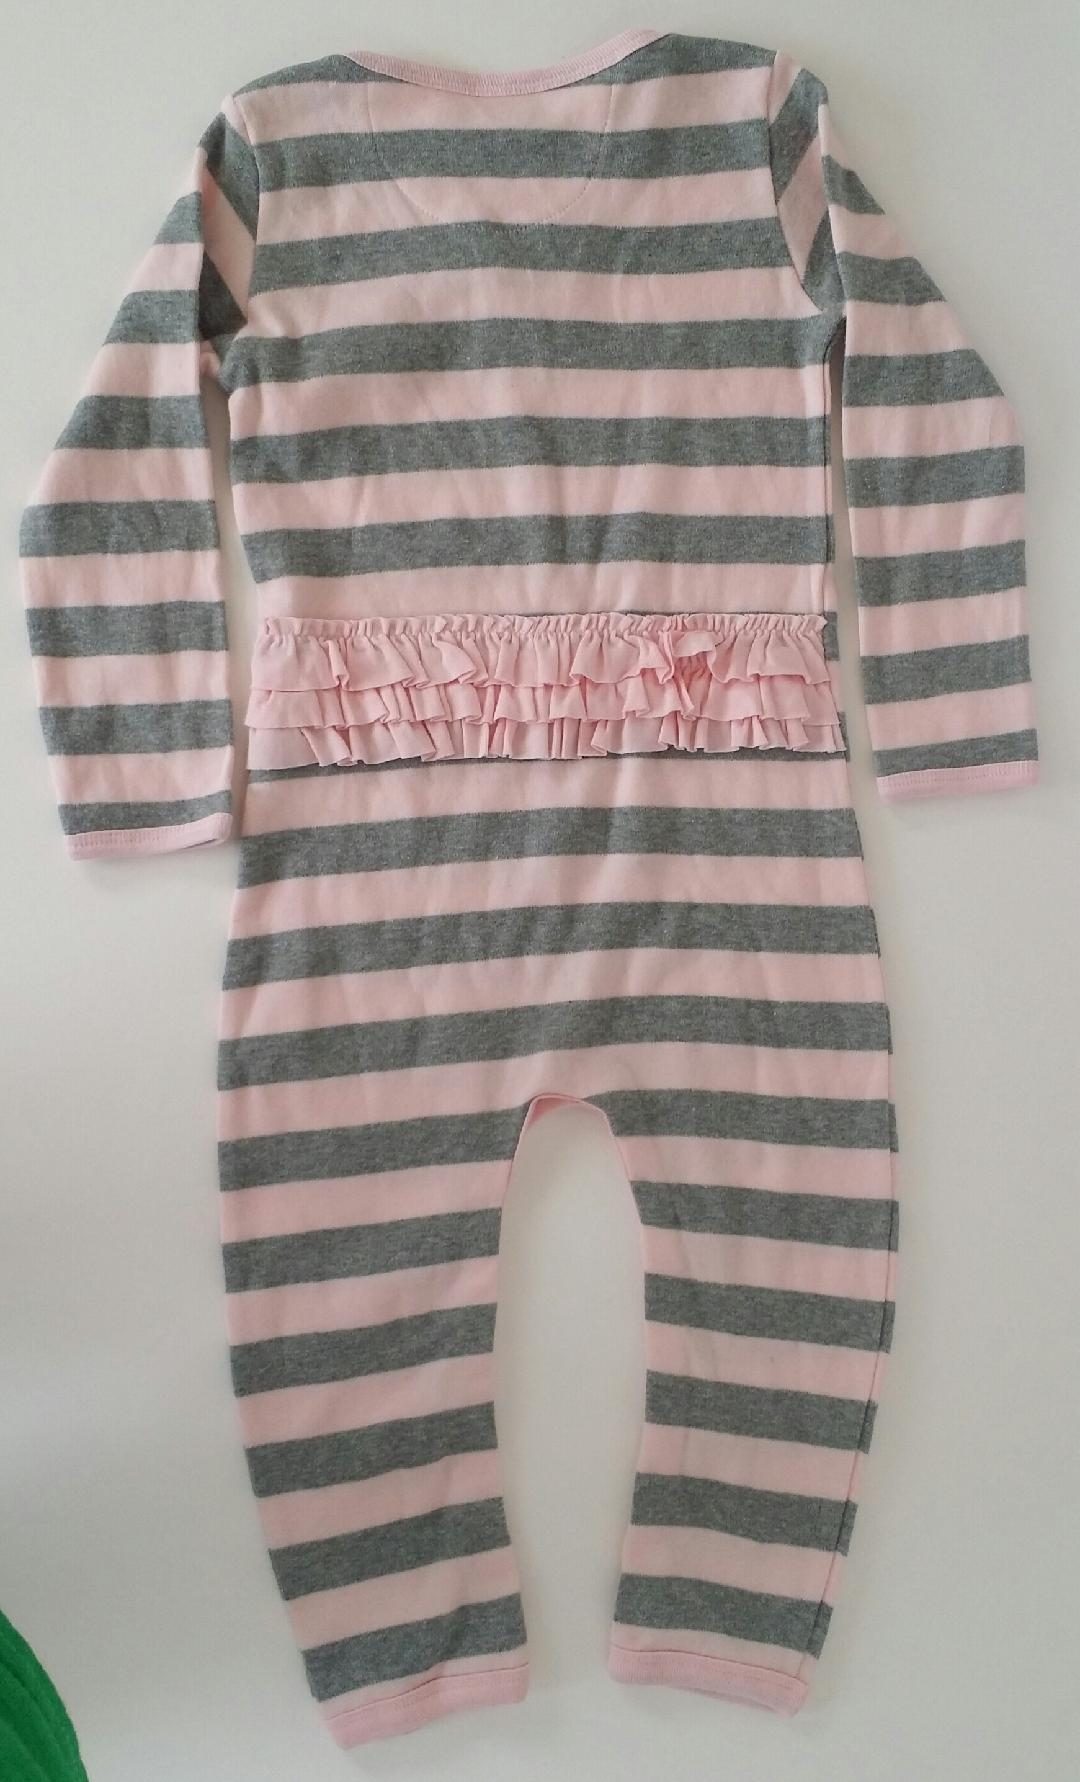 Burts-Bees-Baby--18-24-MONTHS-Striped-Organic-Cotton-Romper_2024022B.jpg